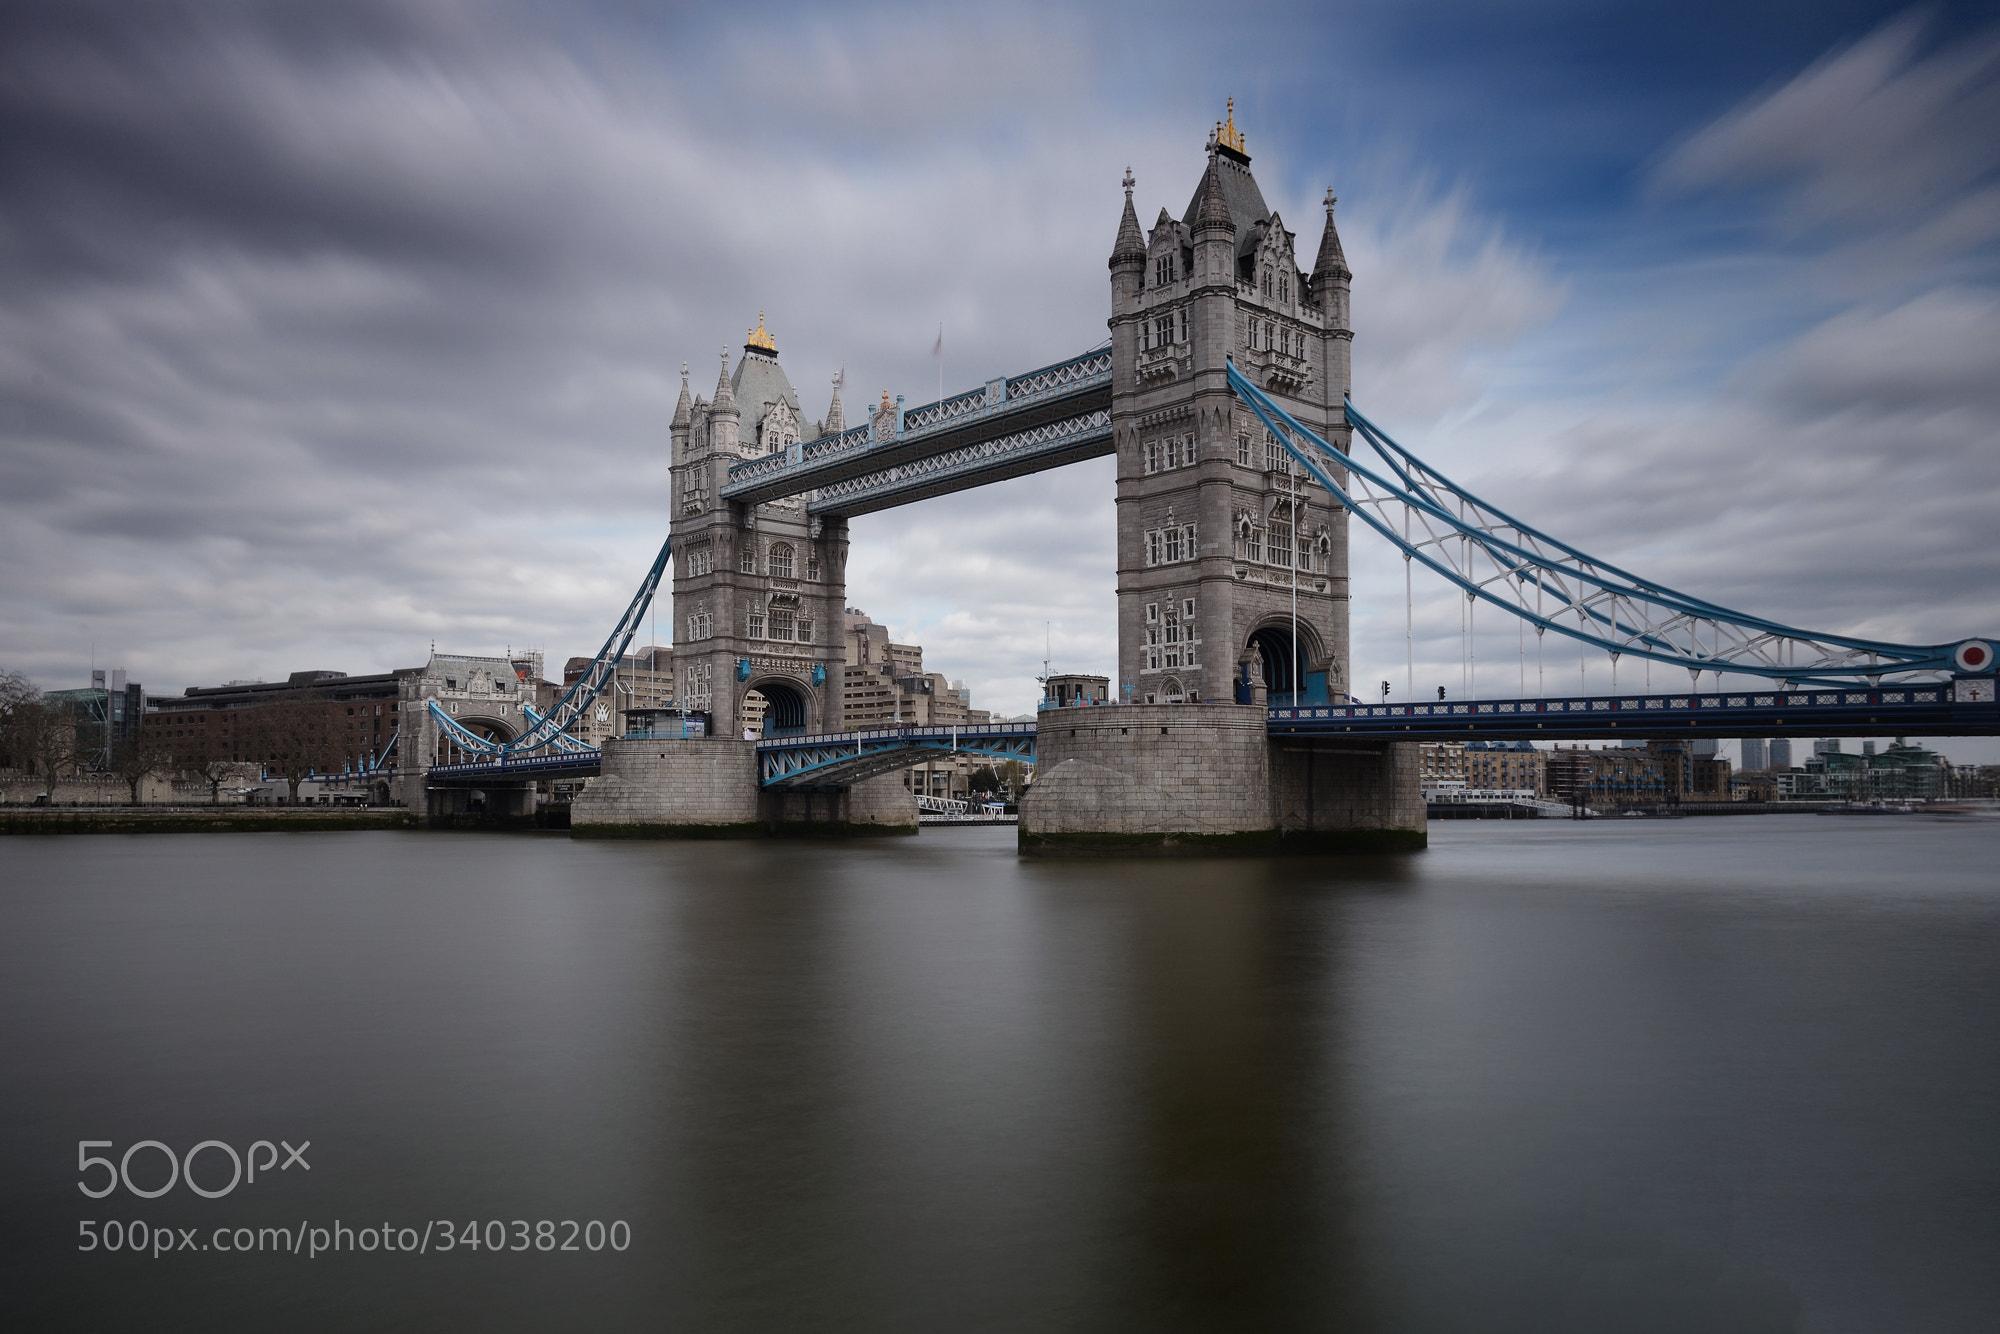 Photograph Tower Bridge by Carlos Pérez on 500px